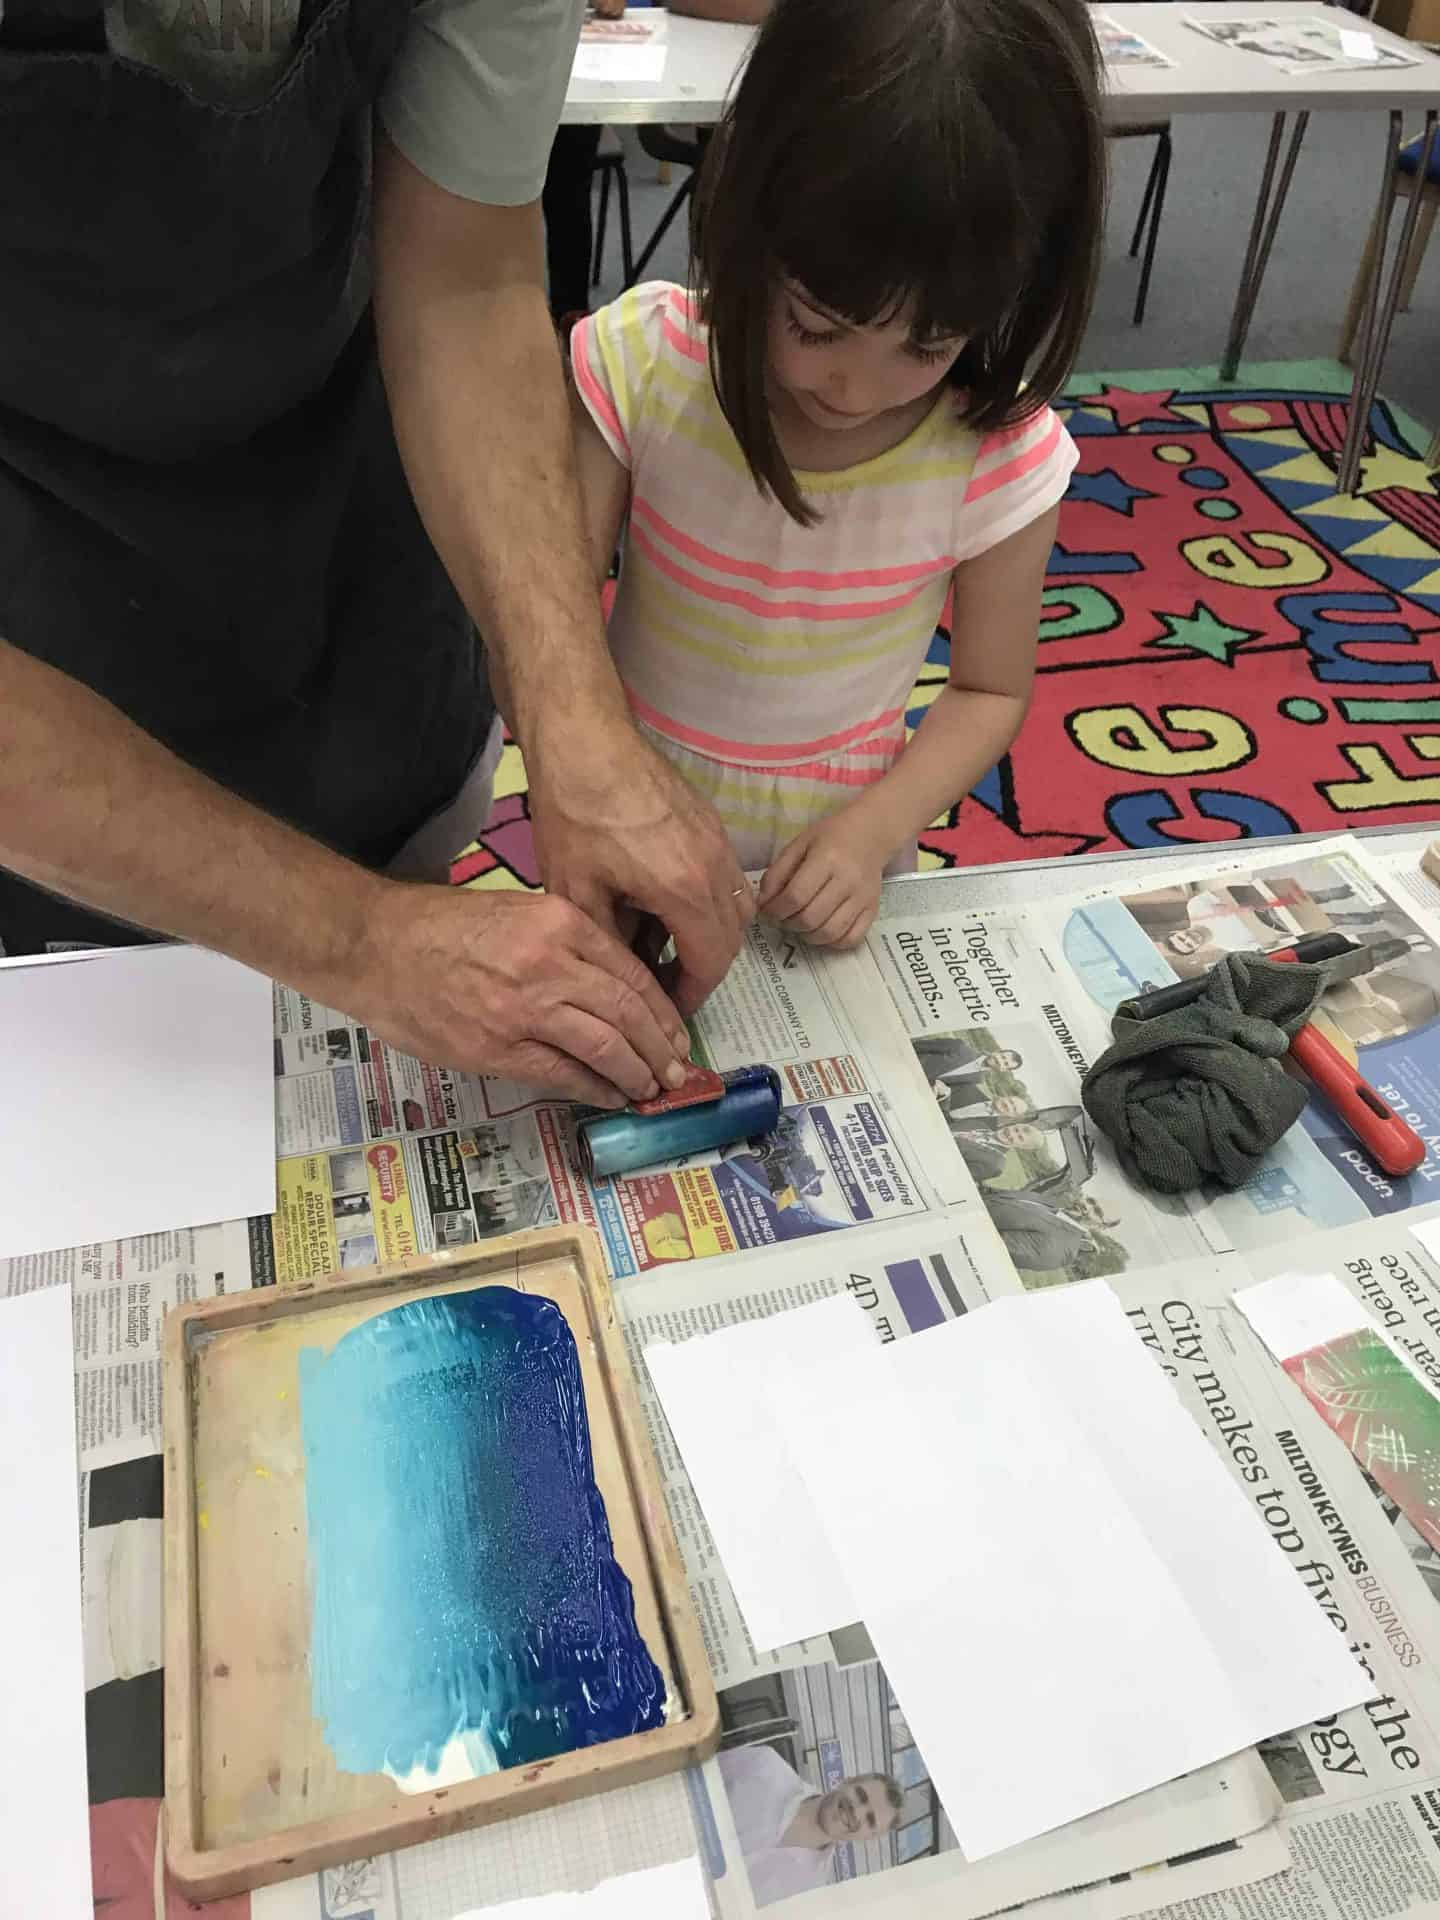 Applying ink to her polystyrene design